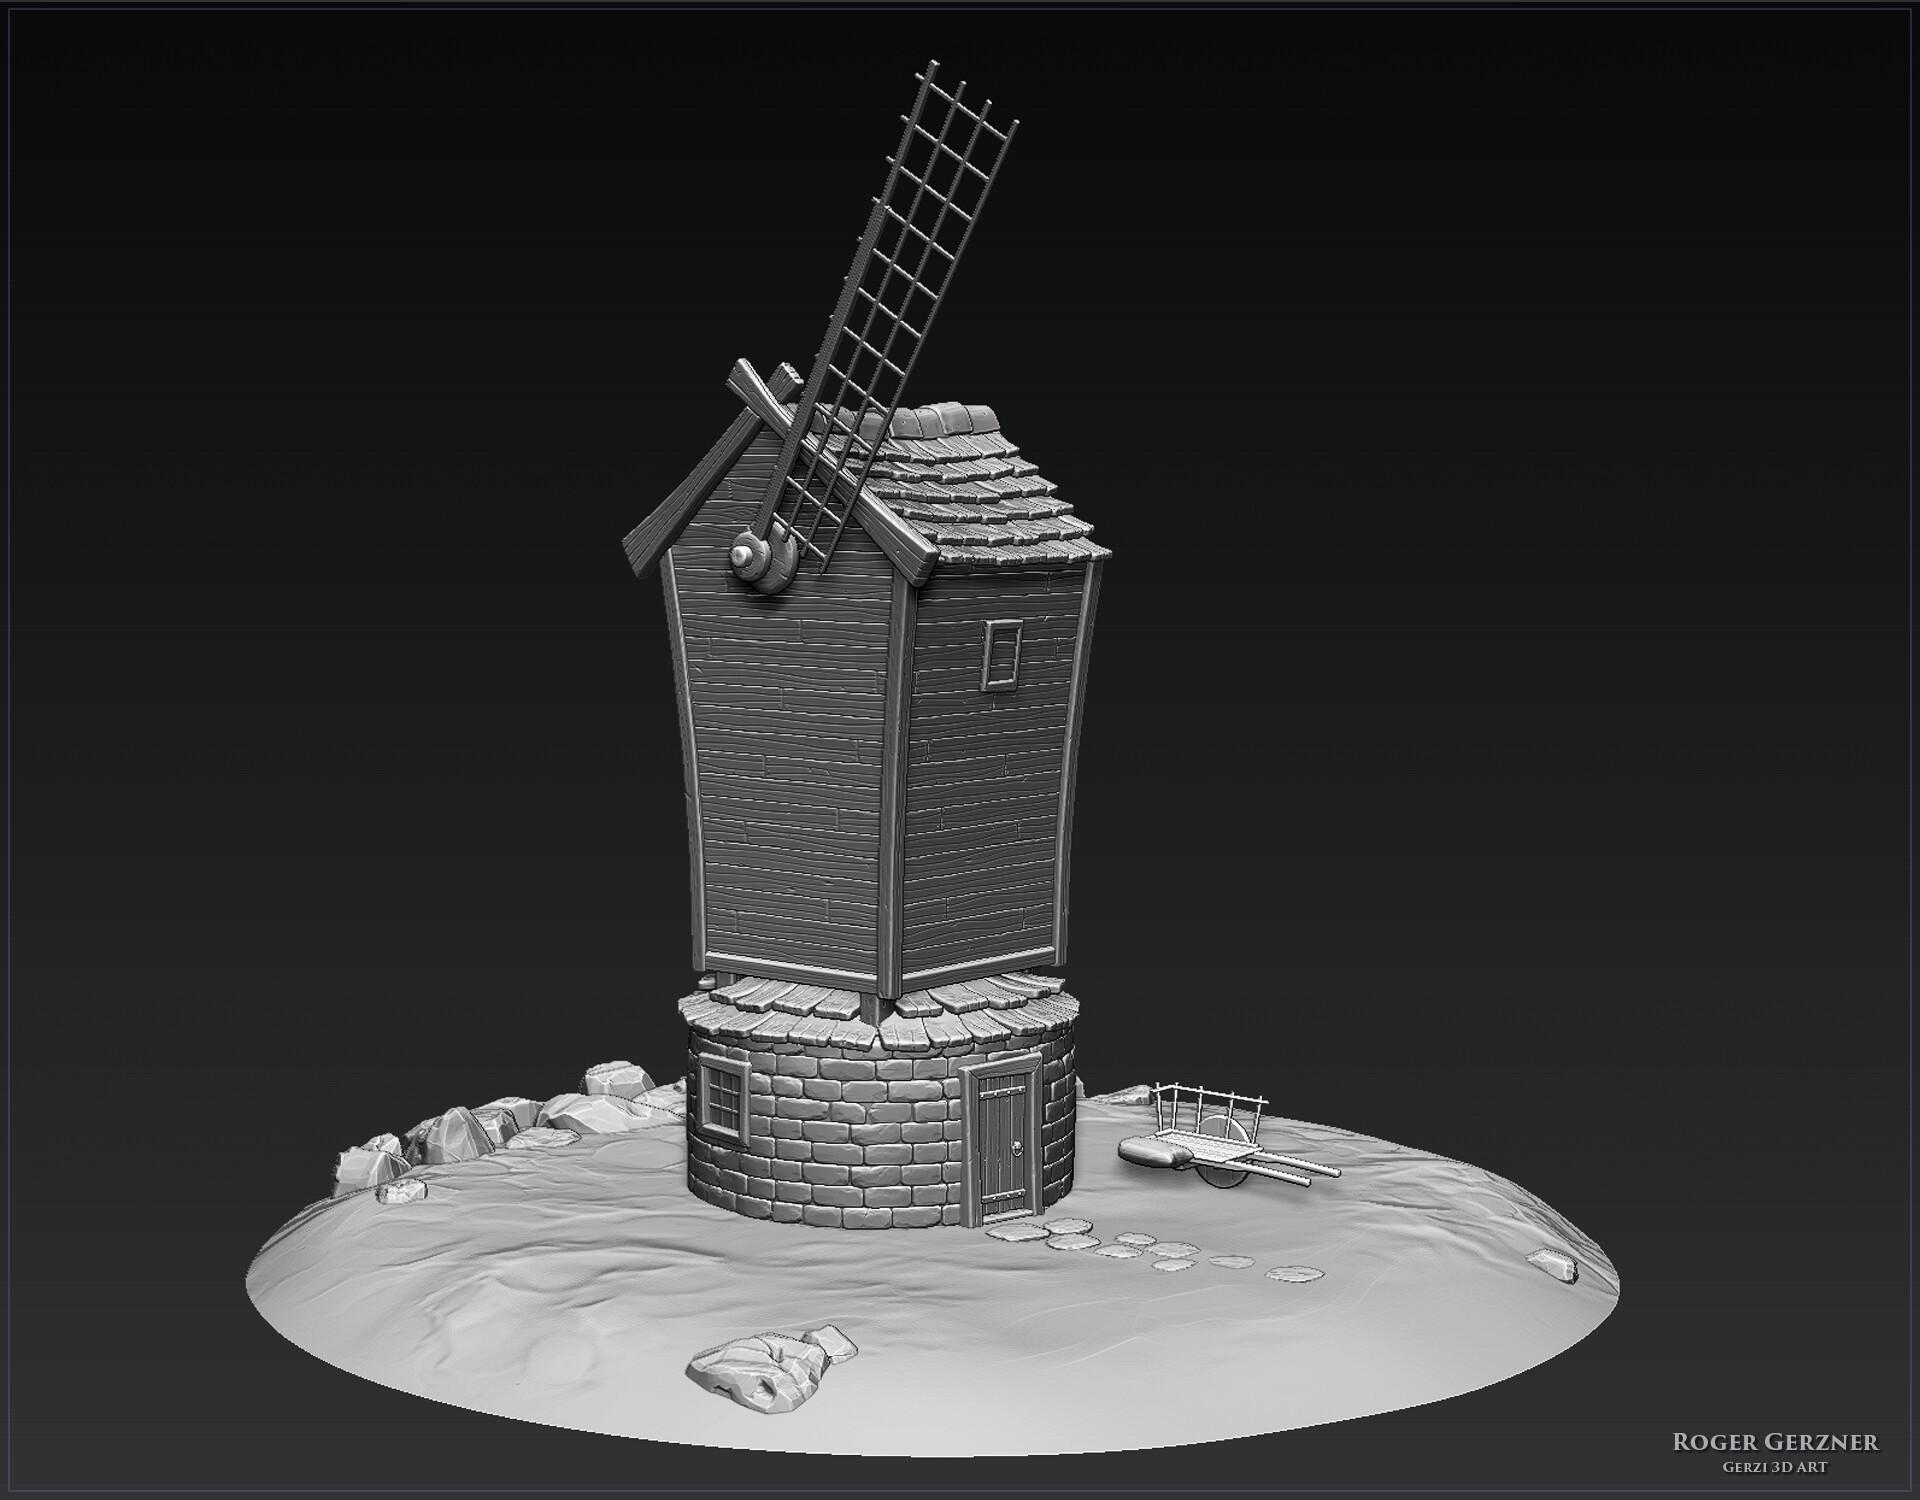 Roger gerzner rogergerzner windmill 06